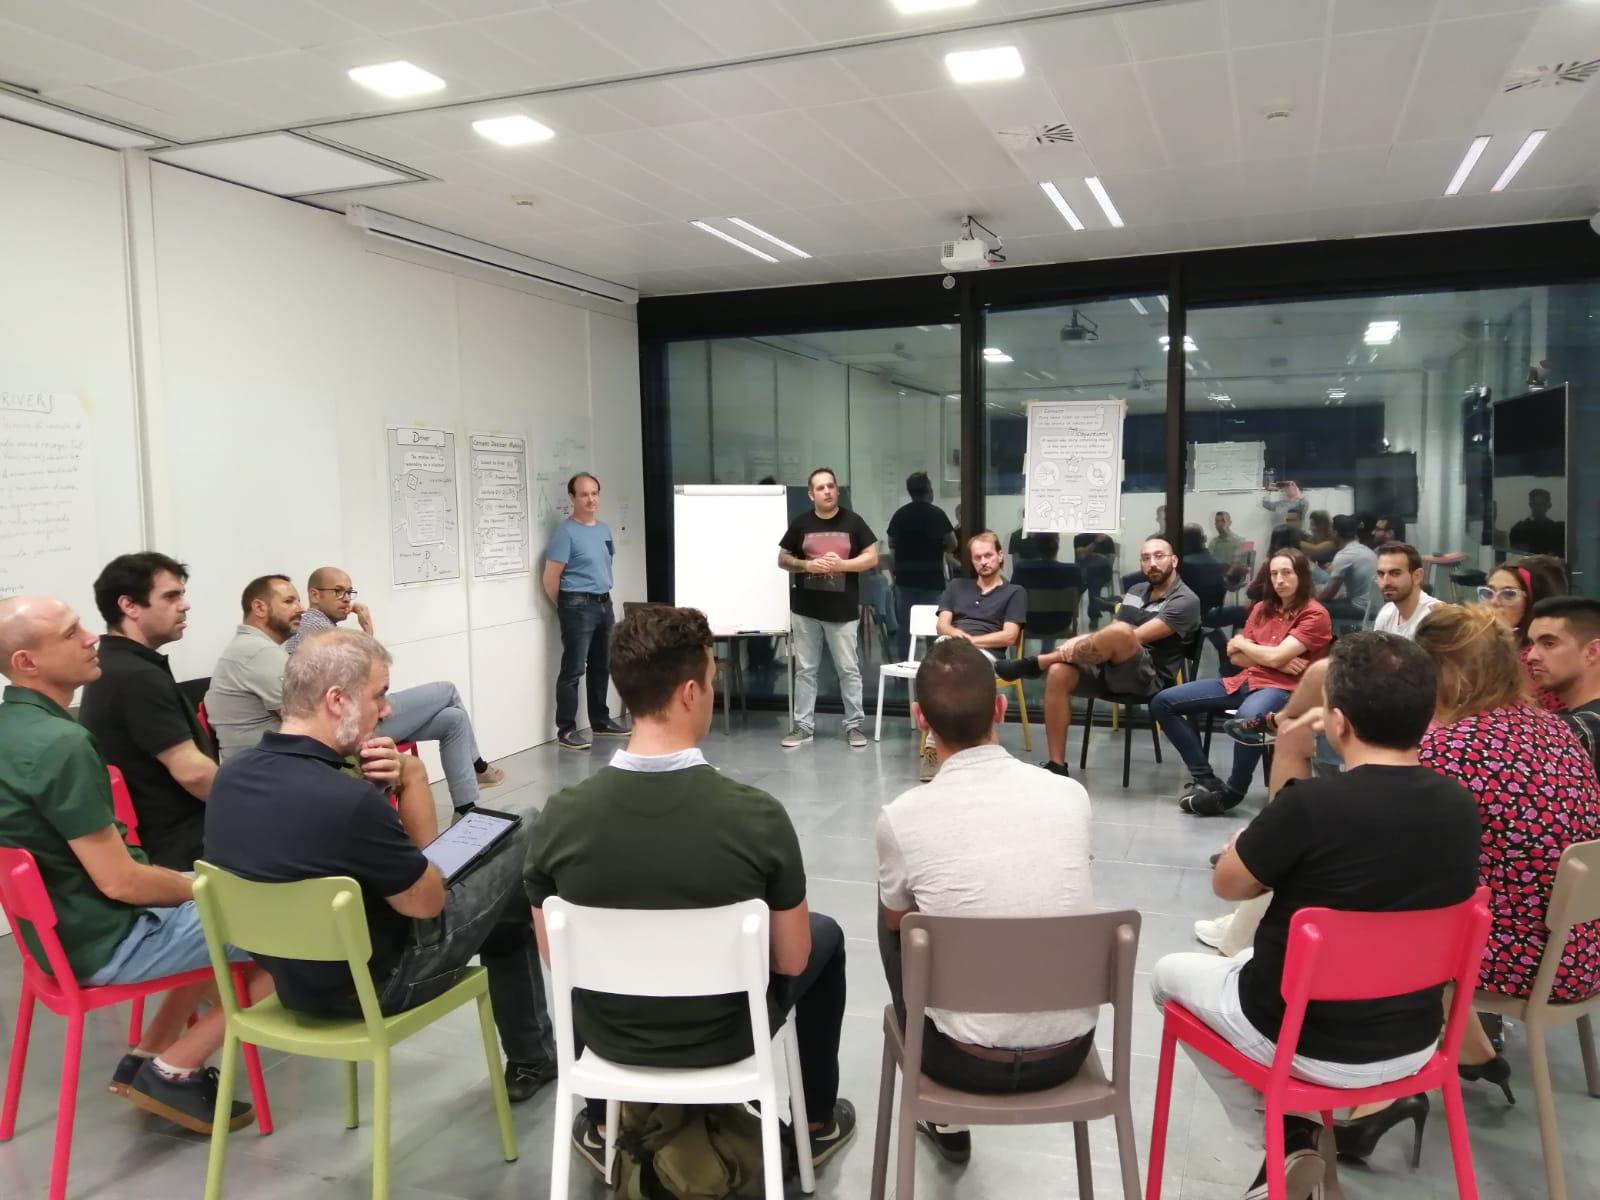 Upcoming Meetups at Voxel